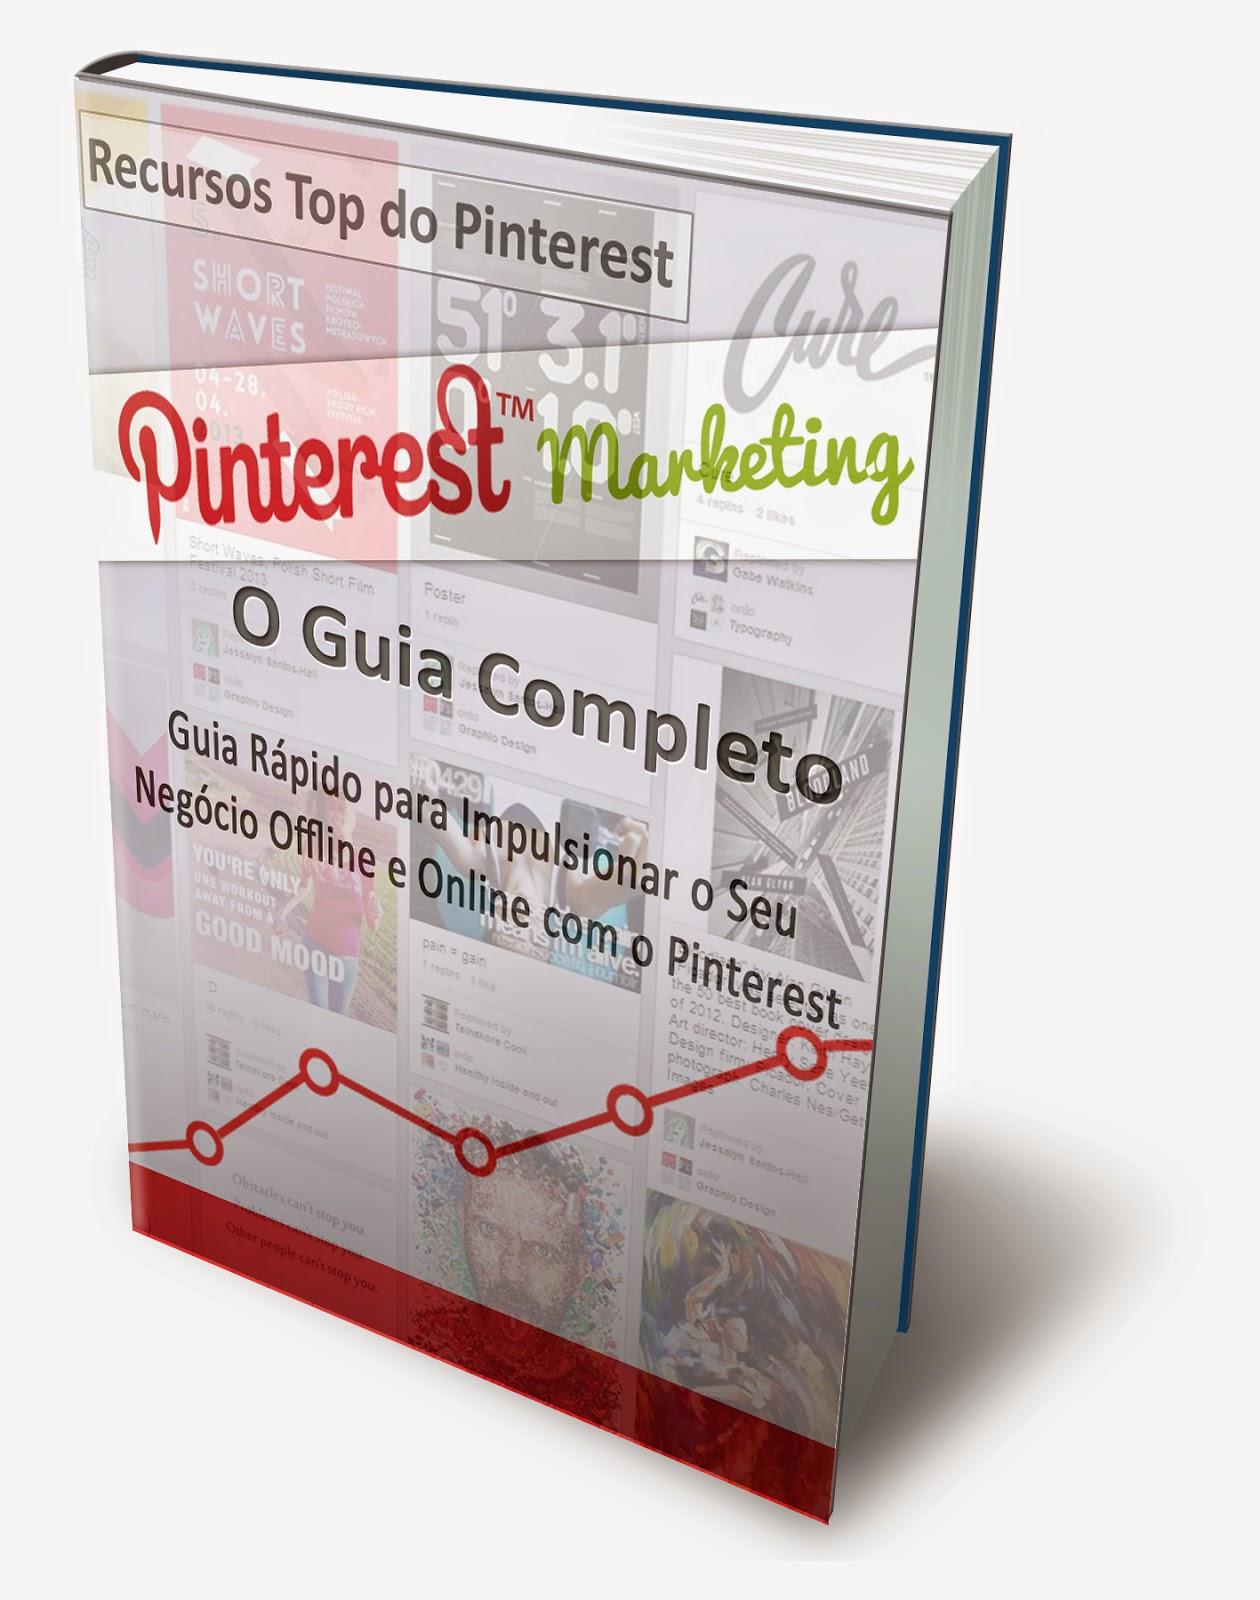 Guia Pinterest Marketing